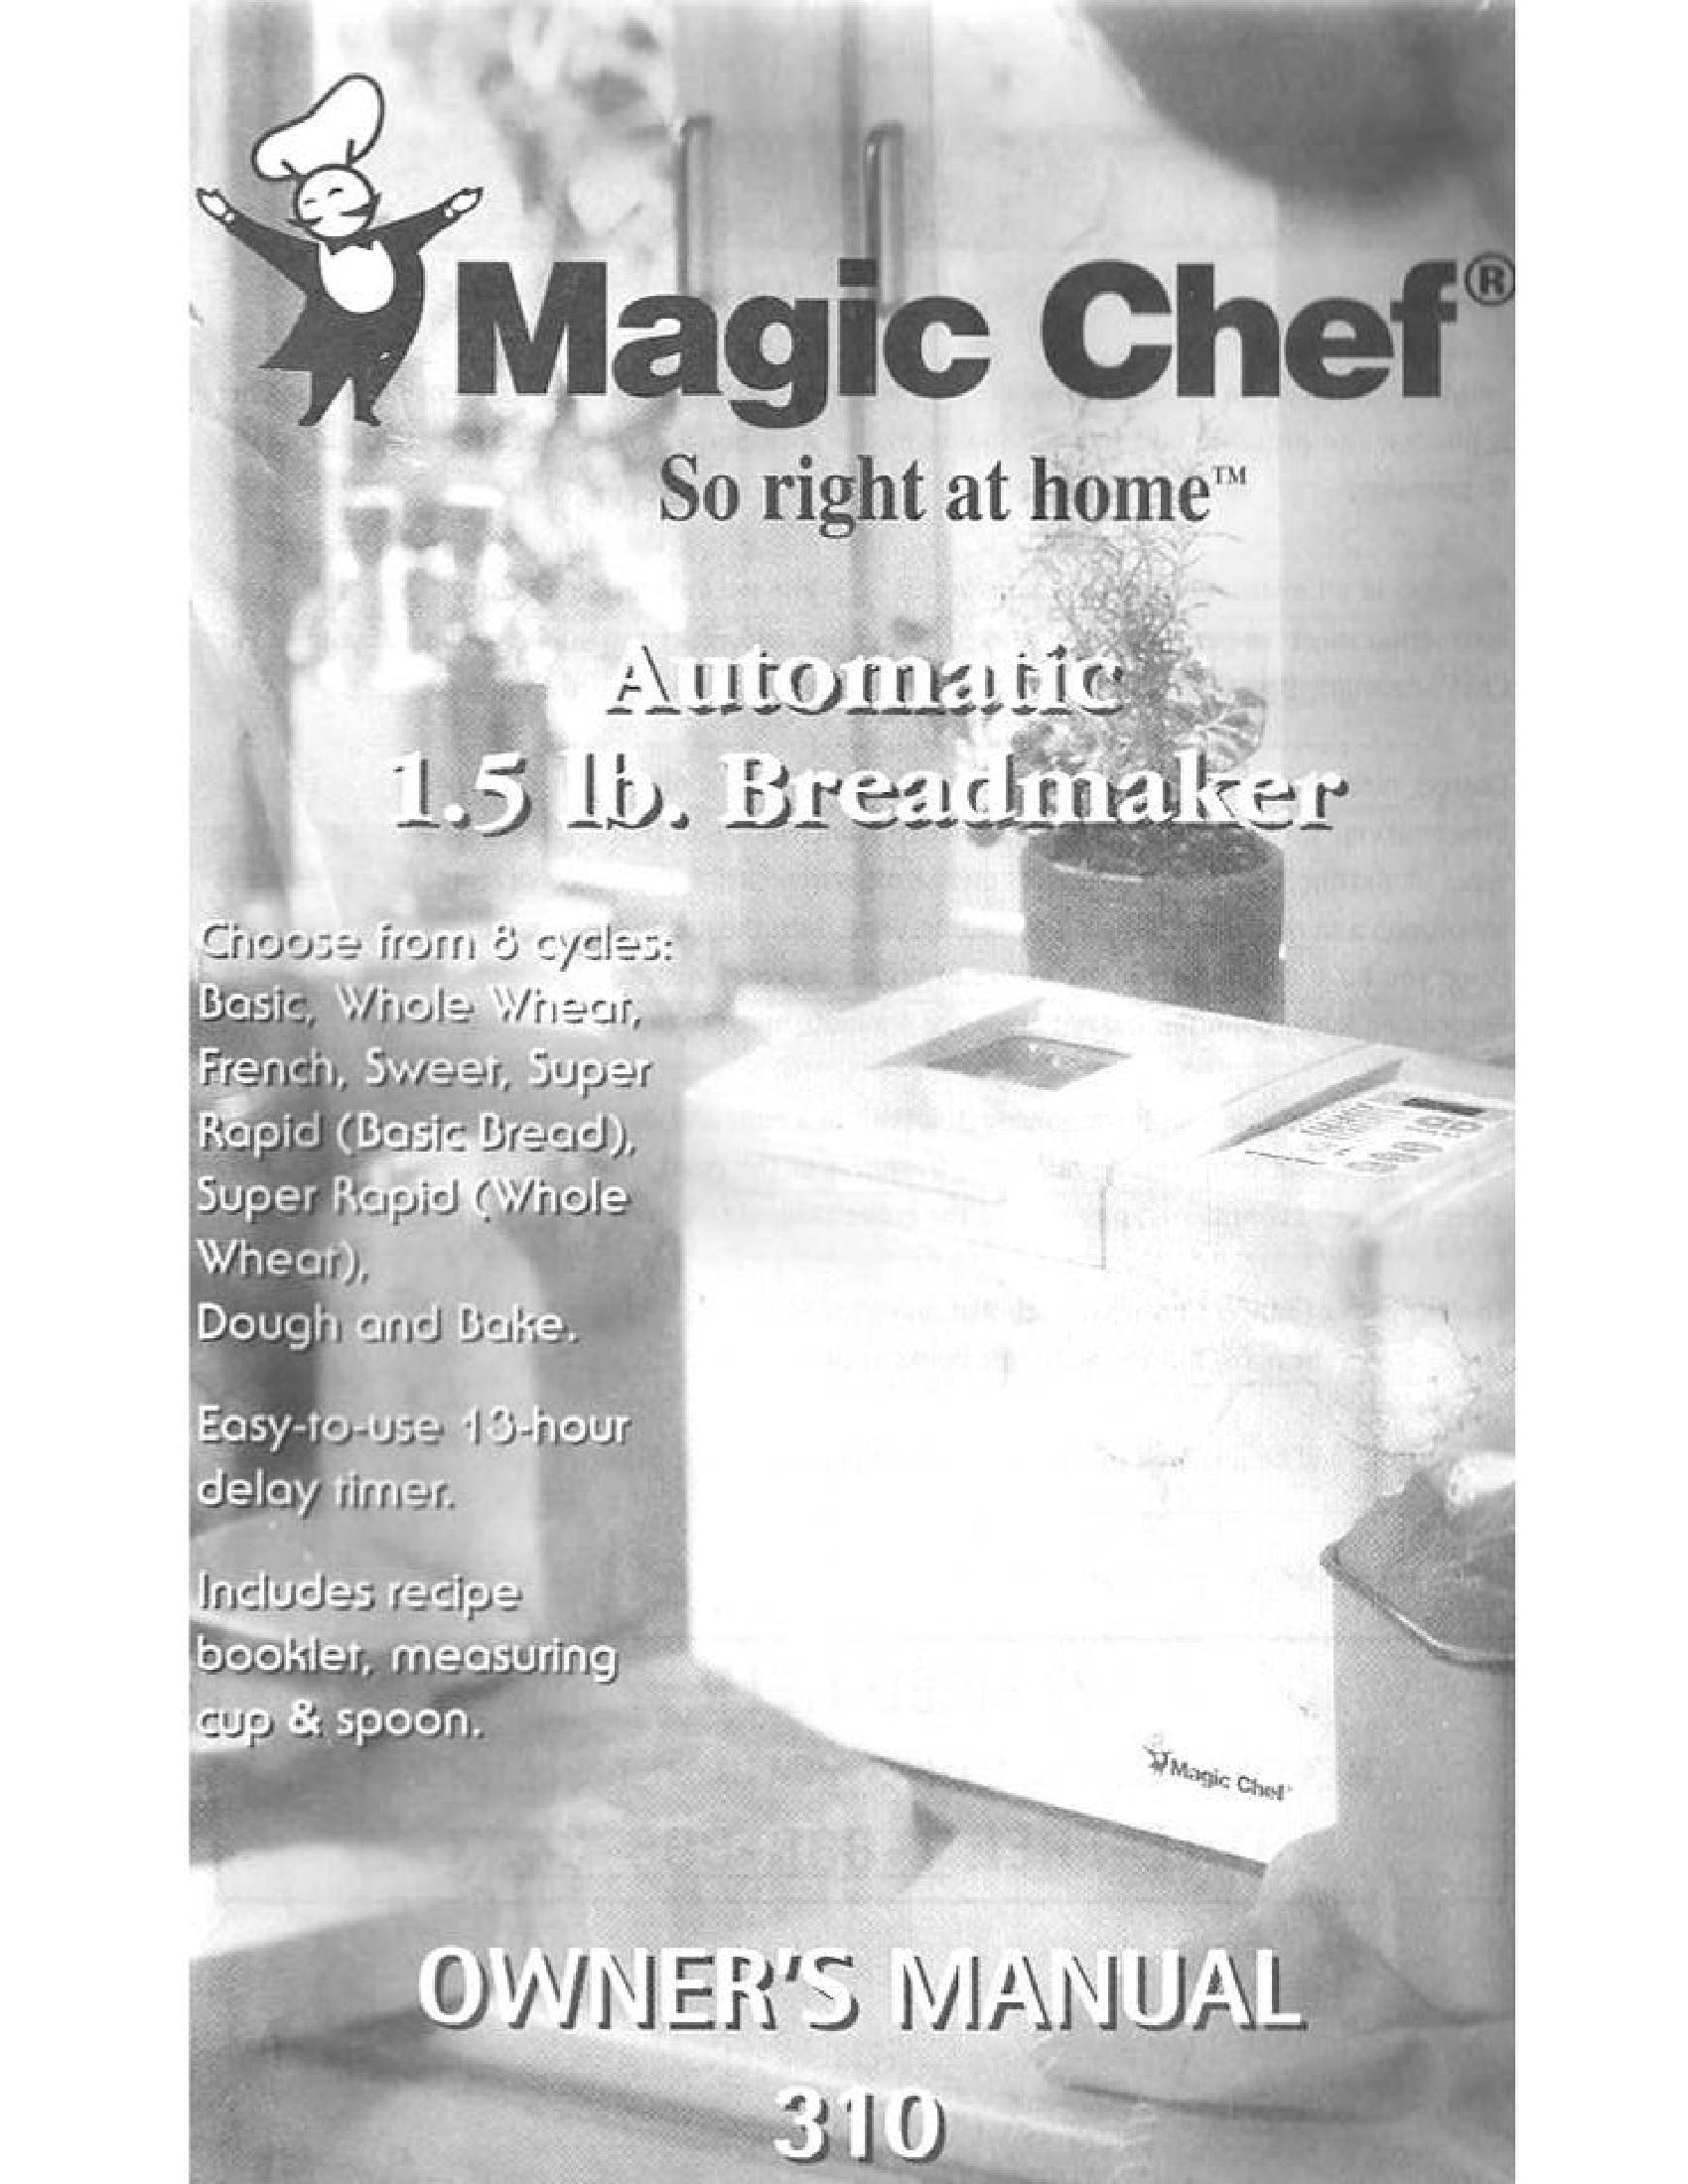 magic chef bread machine manual cbm310 car owners manual u2022 rh manualinstructionet today Magic Chef Grill Magic Chef ManualsOnline